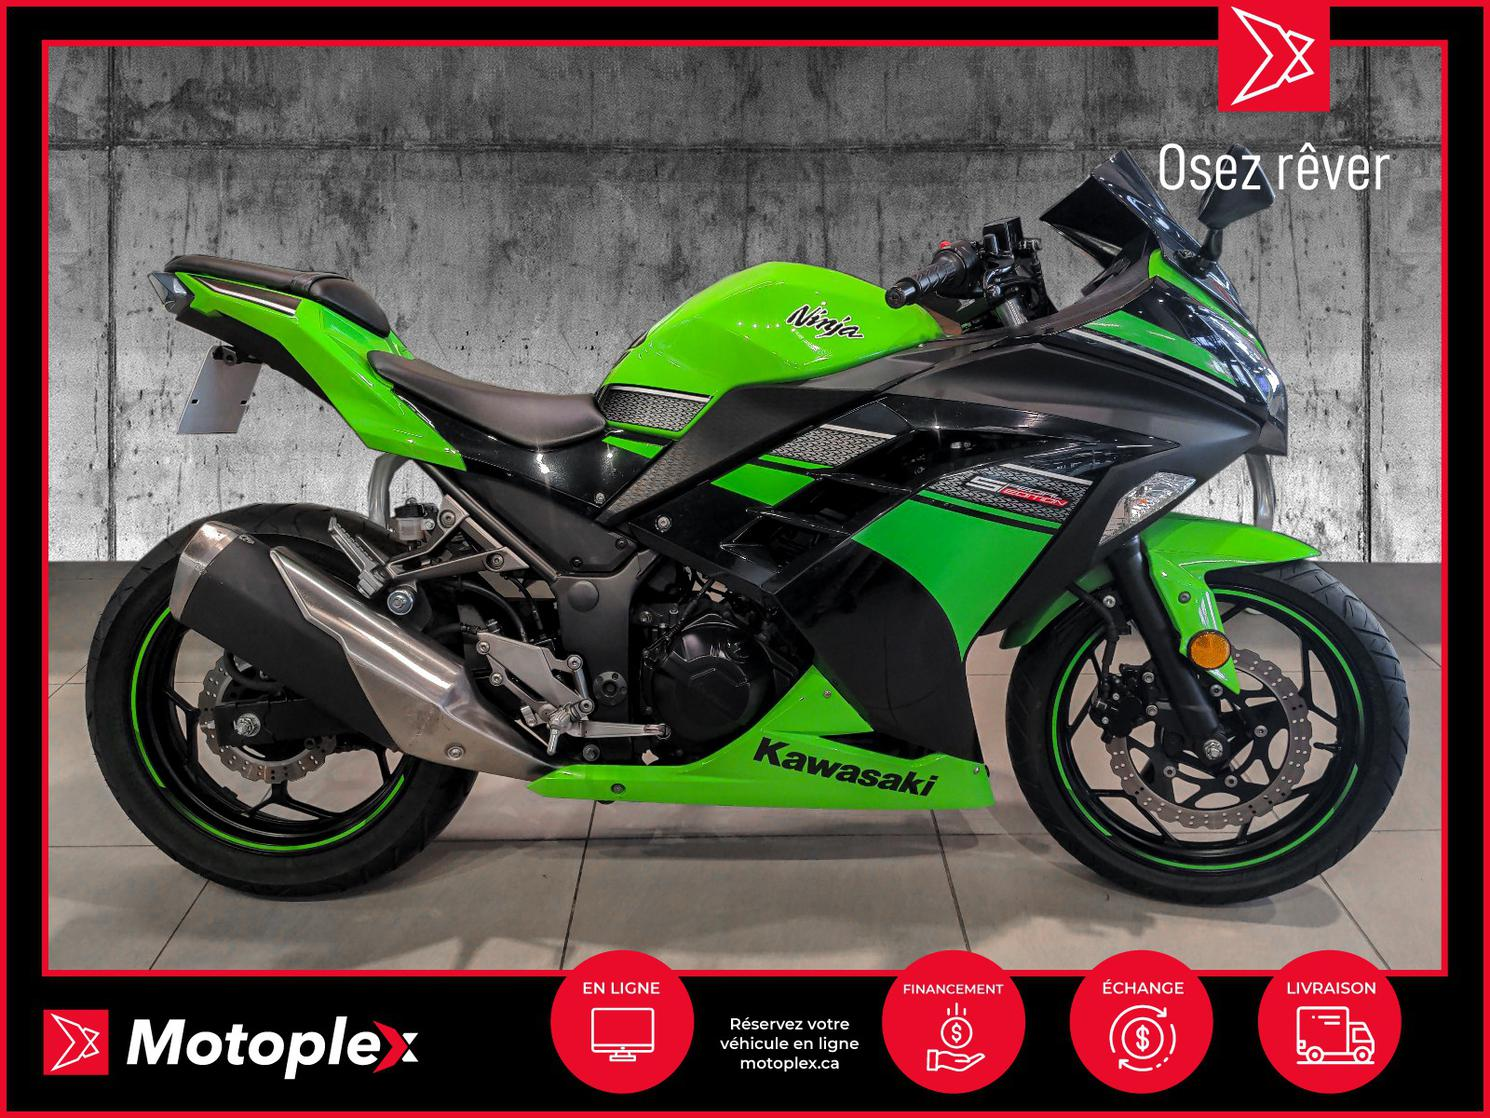 2013 Kawasaki NINJA 300 SE 35$/semaine